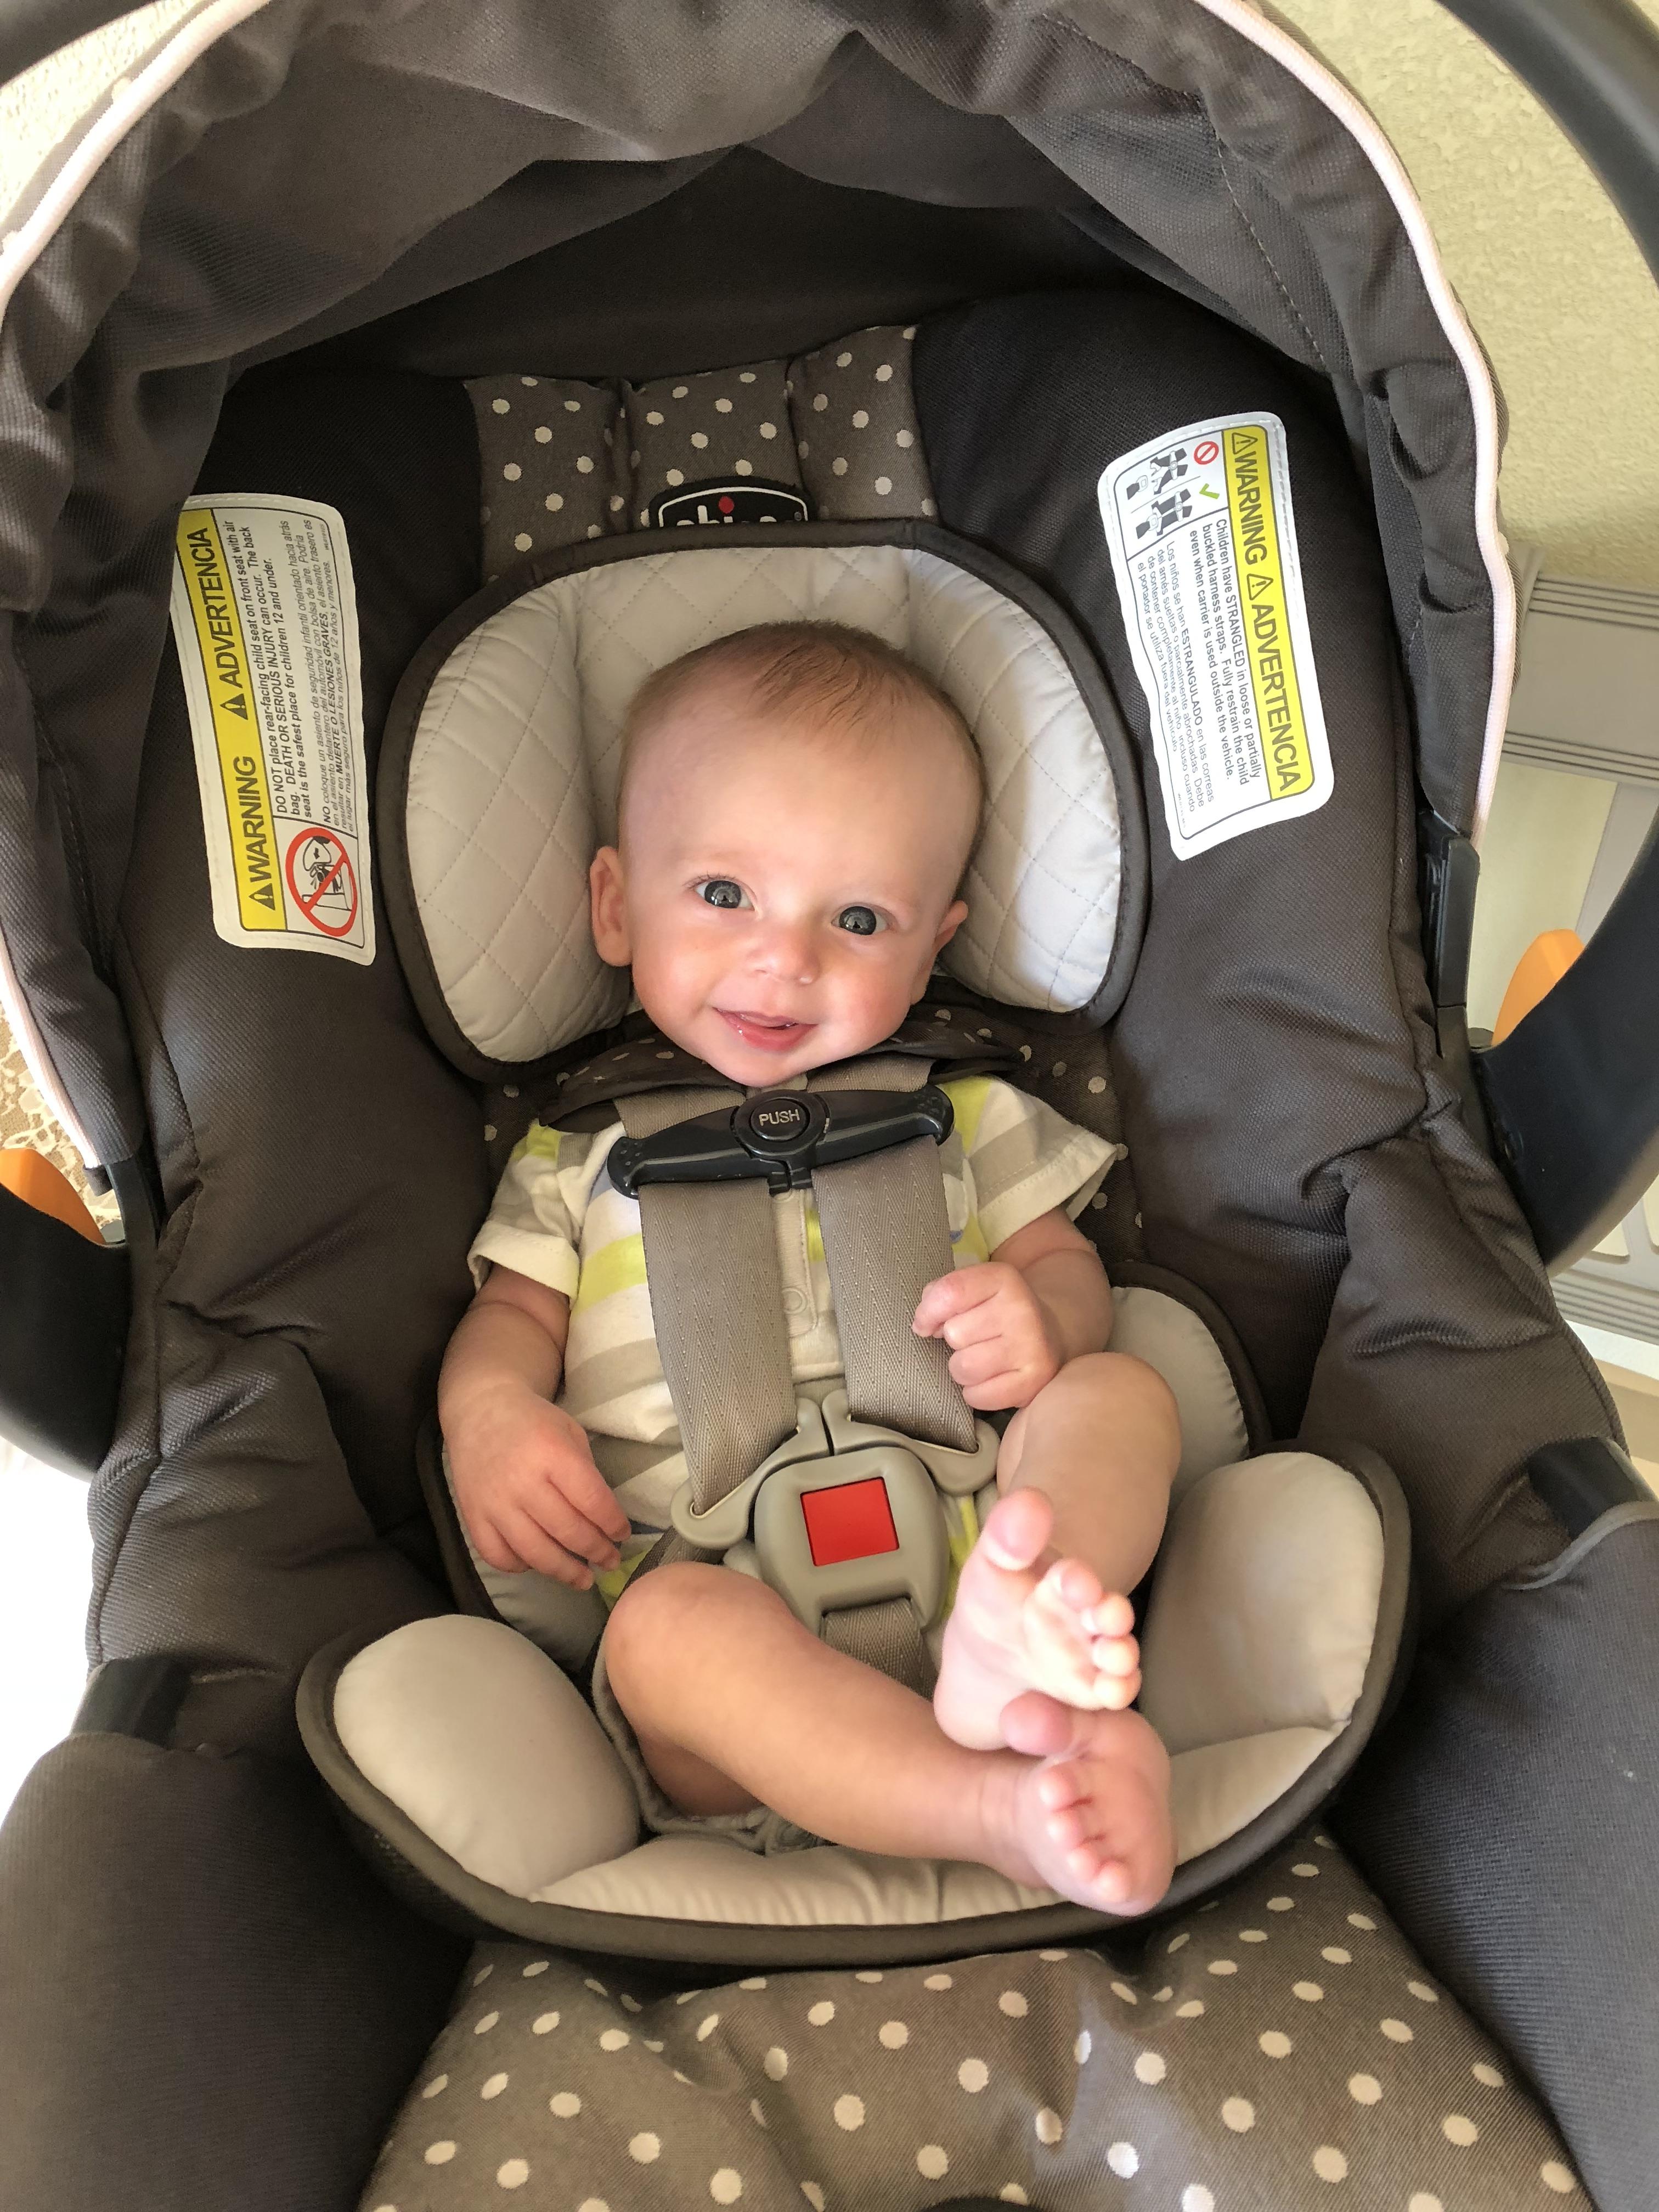 Nebraska Implements New Car Seat Laws Simmons Olsen Law Firm